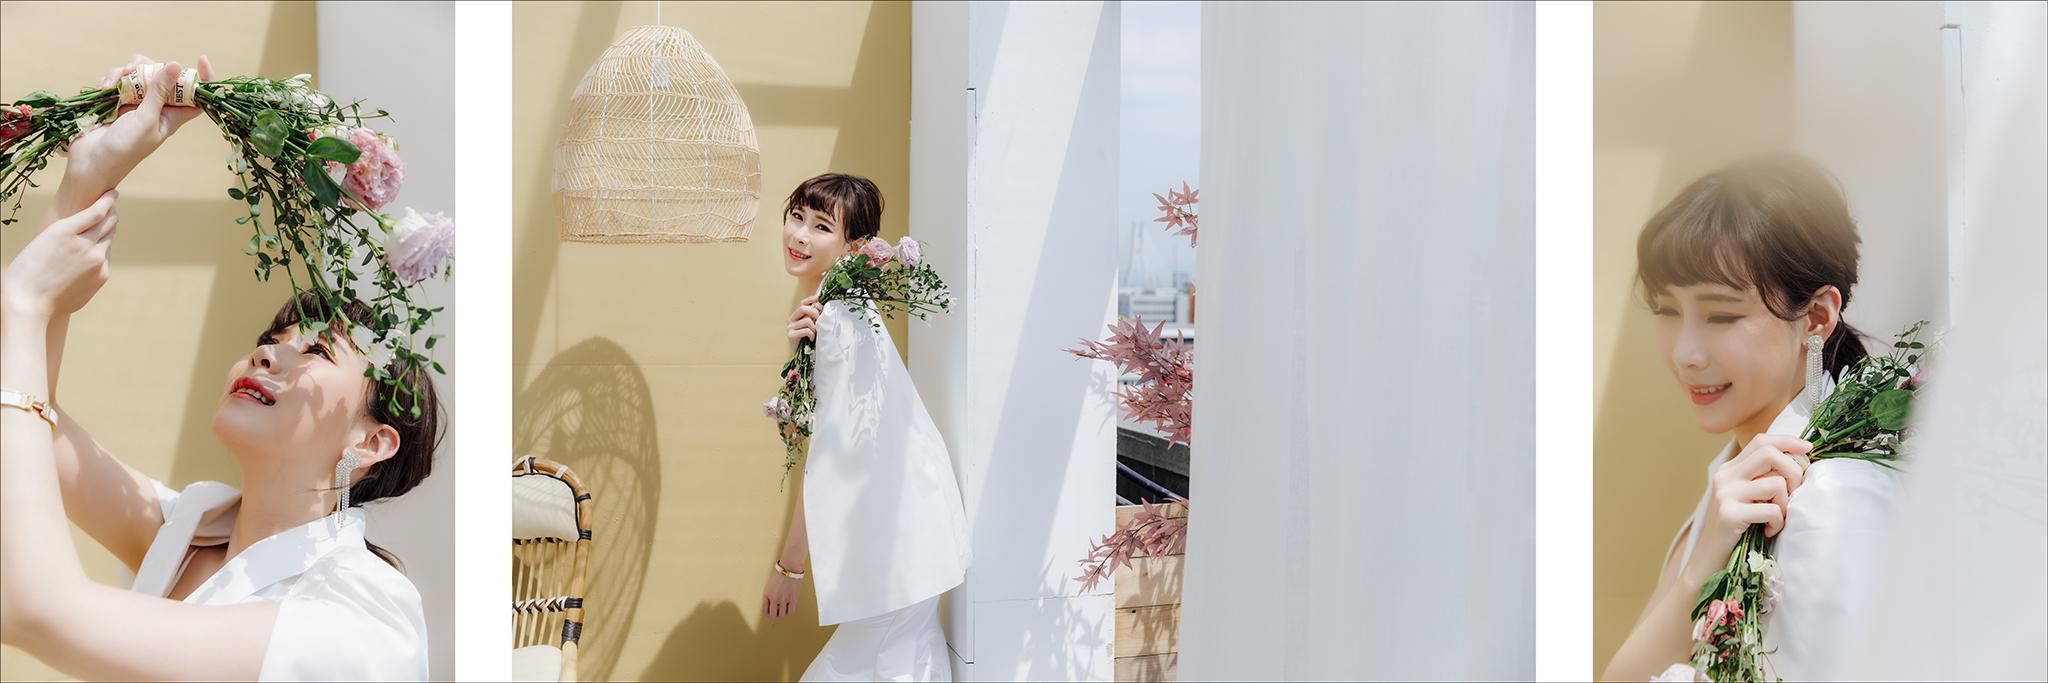 49883214966 f641e79326 o - 【自主婚紗】+潤潤+